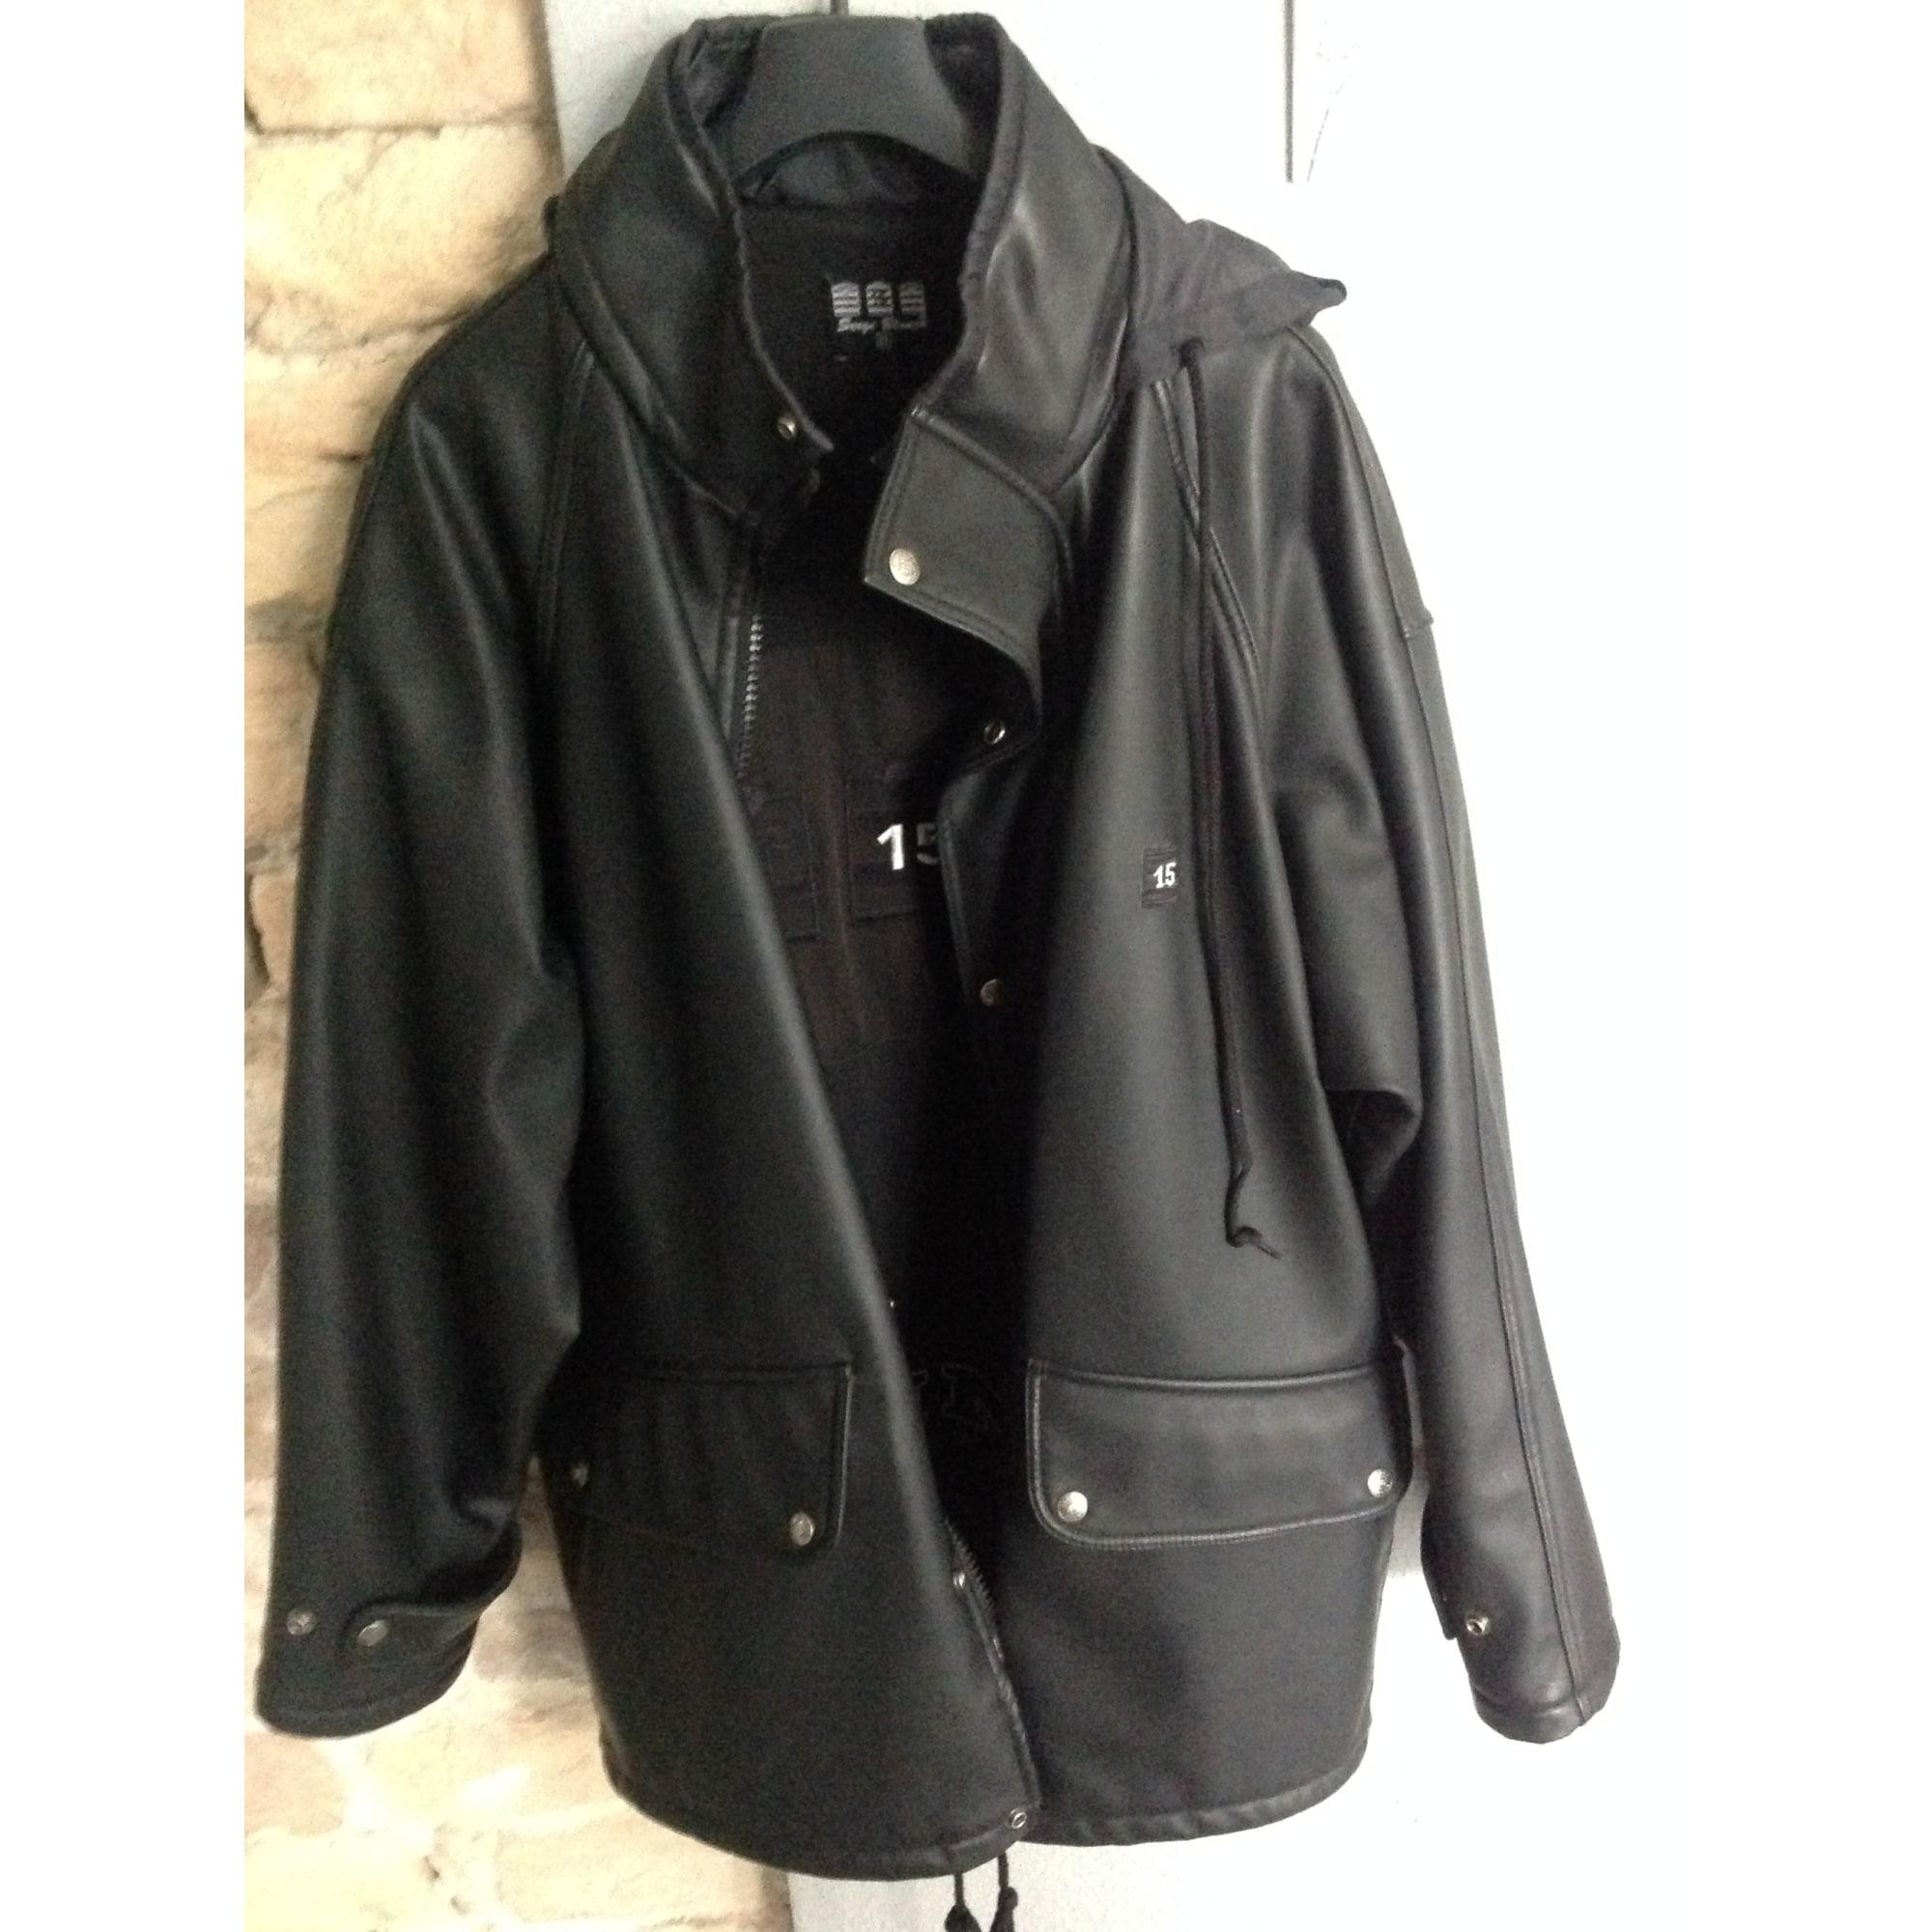 Parka SERGE BLANCO 58 (XL) noir vendu par Mathhuta - 7201538 03a9a6feeaf